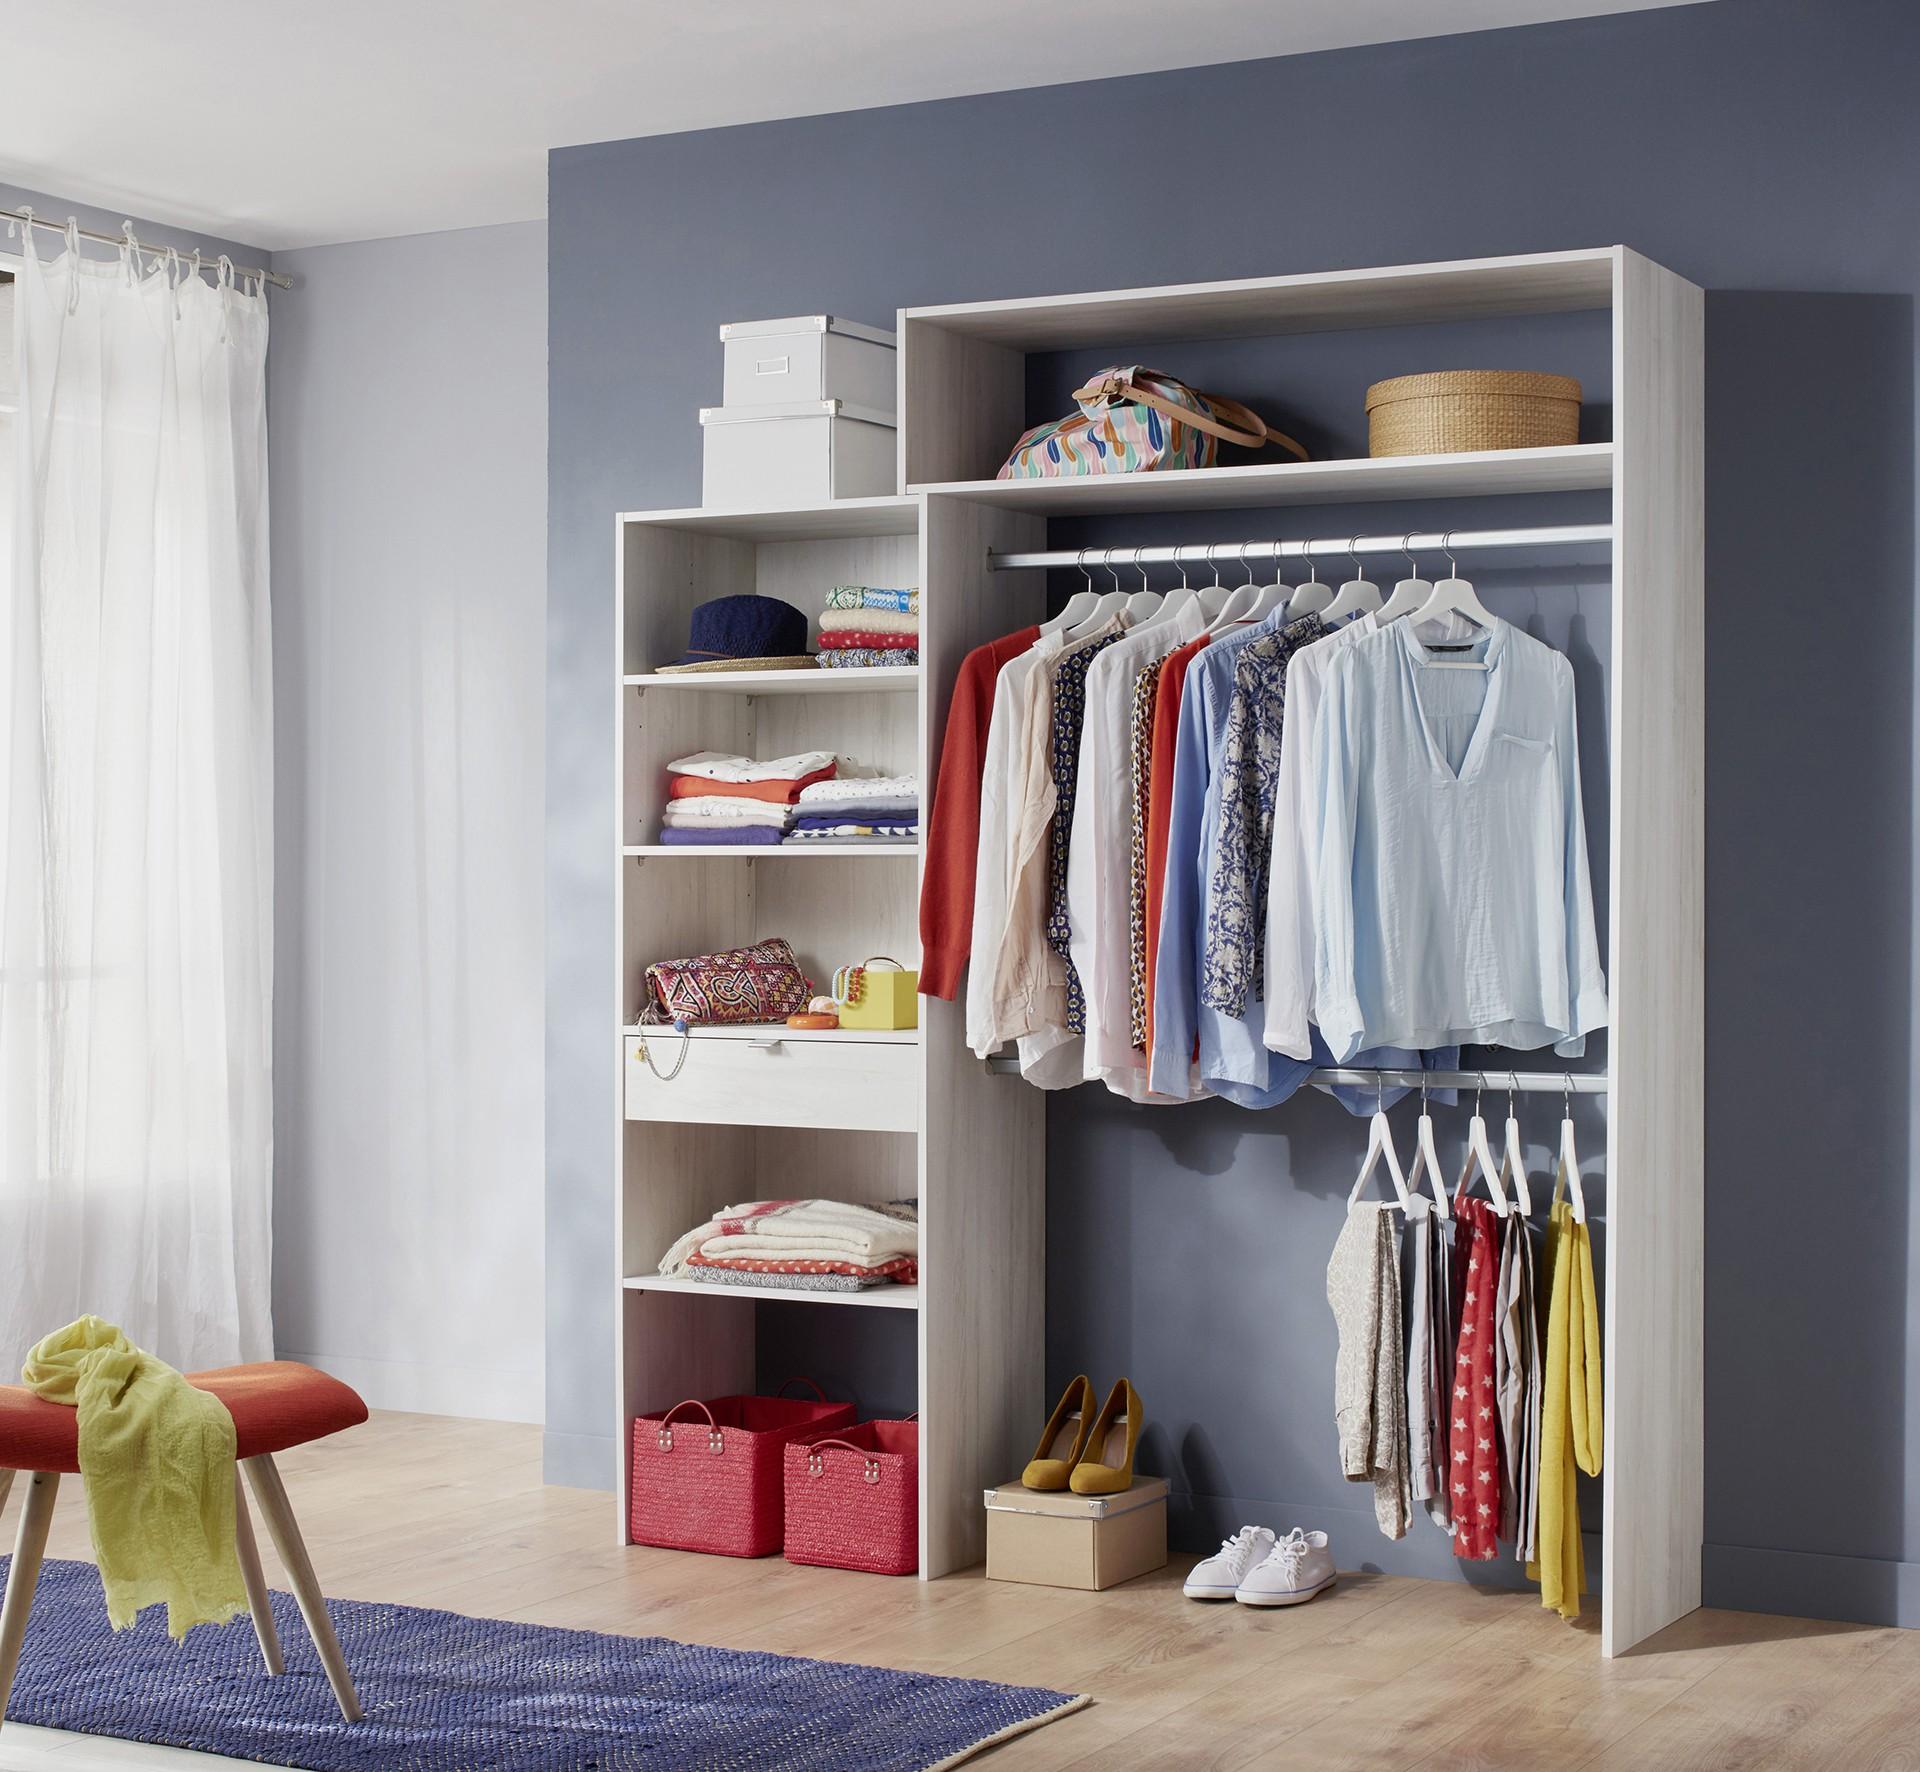 201618221 lapeyre hawai lapeyre presse. Black Bedroom Furniture Sets. Home Design Ideas